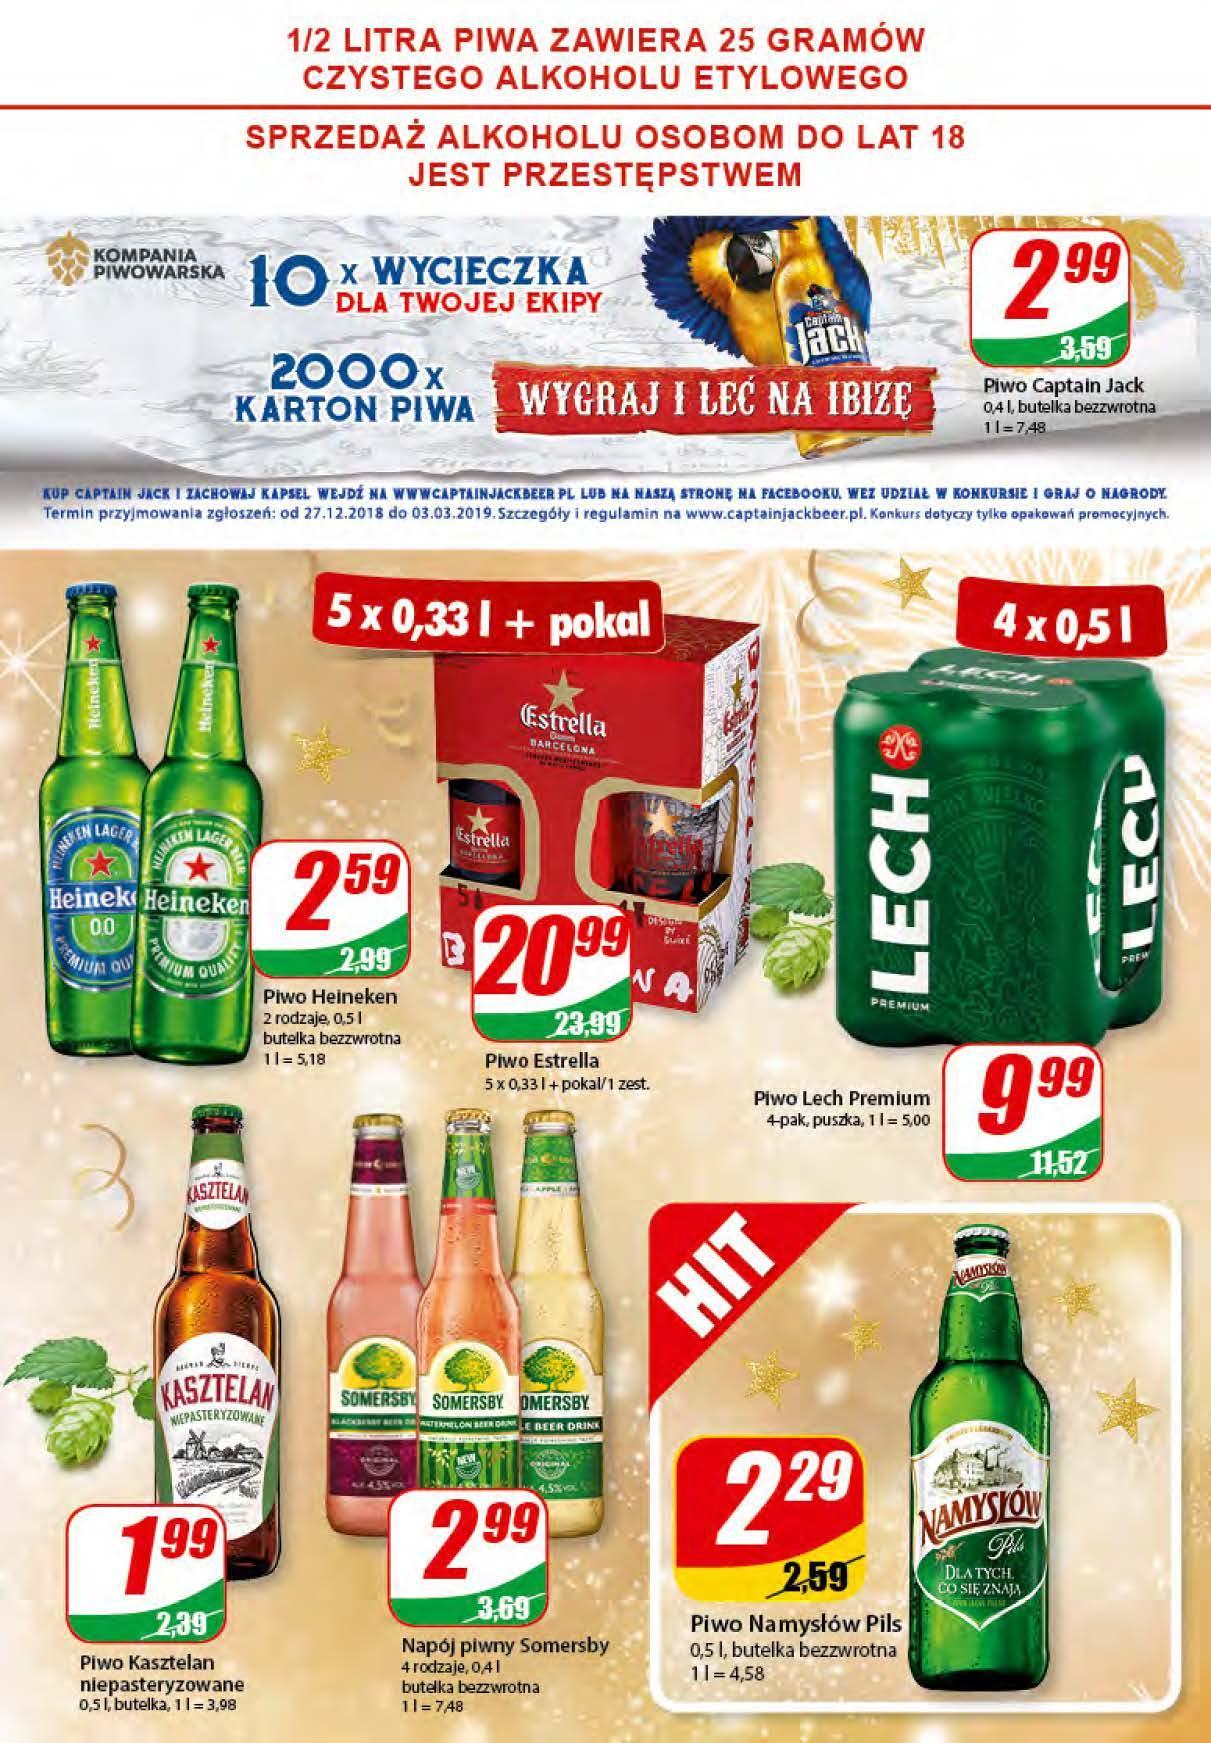 Gazetka promocyjna DINO do 31/12/2018 str.13